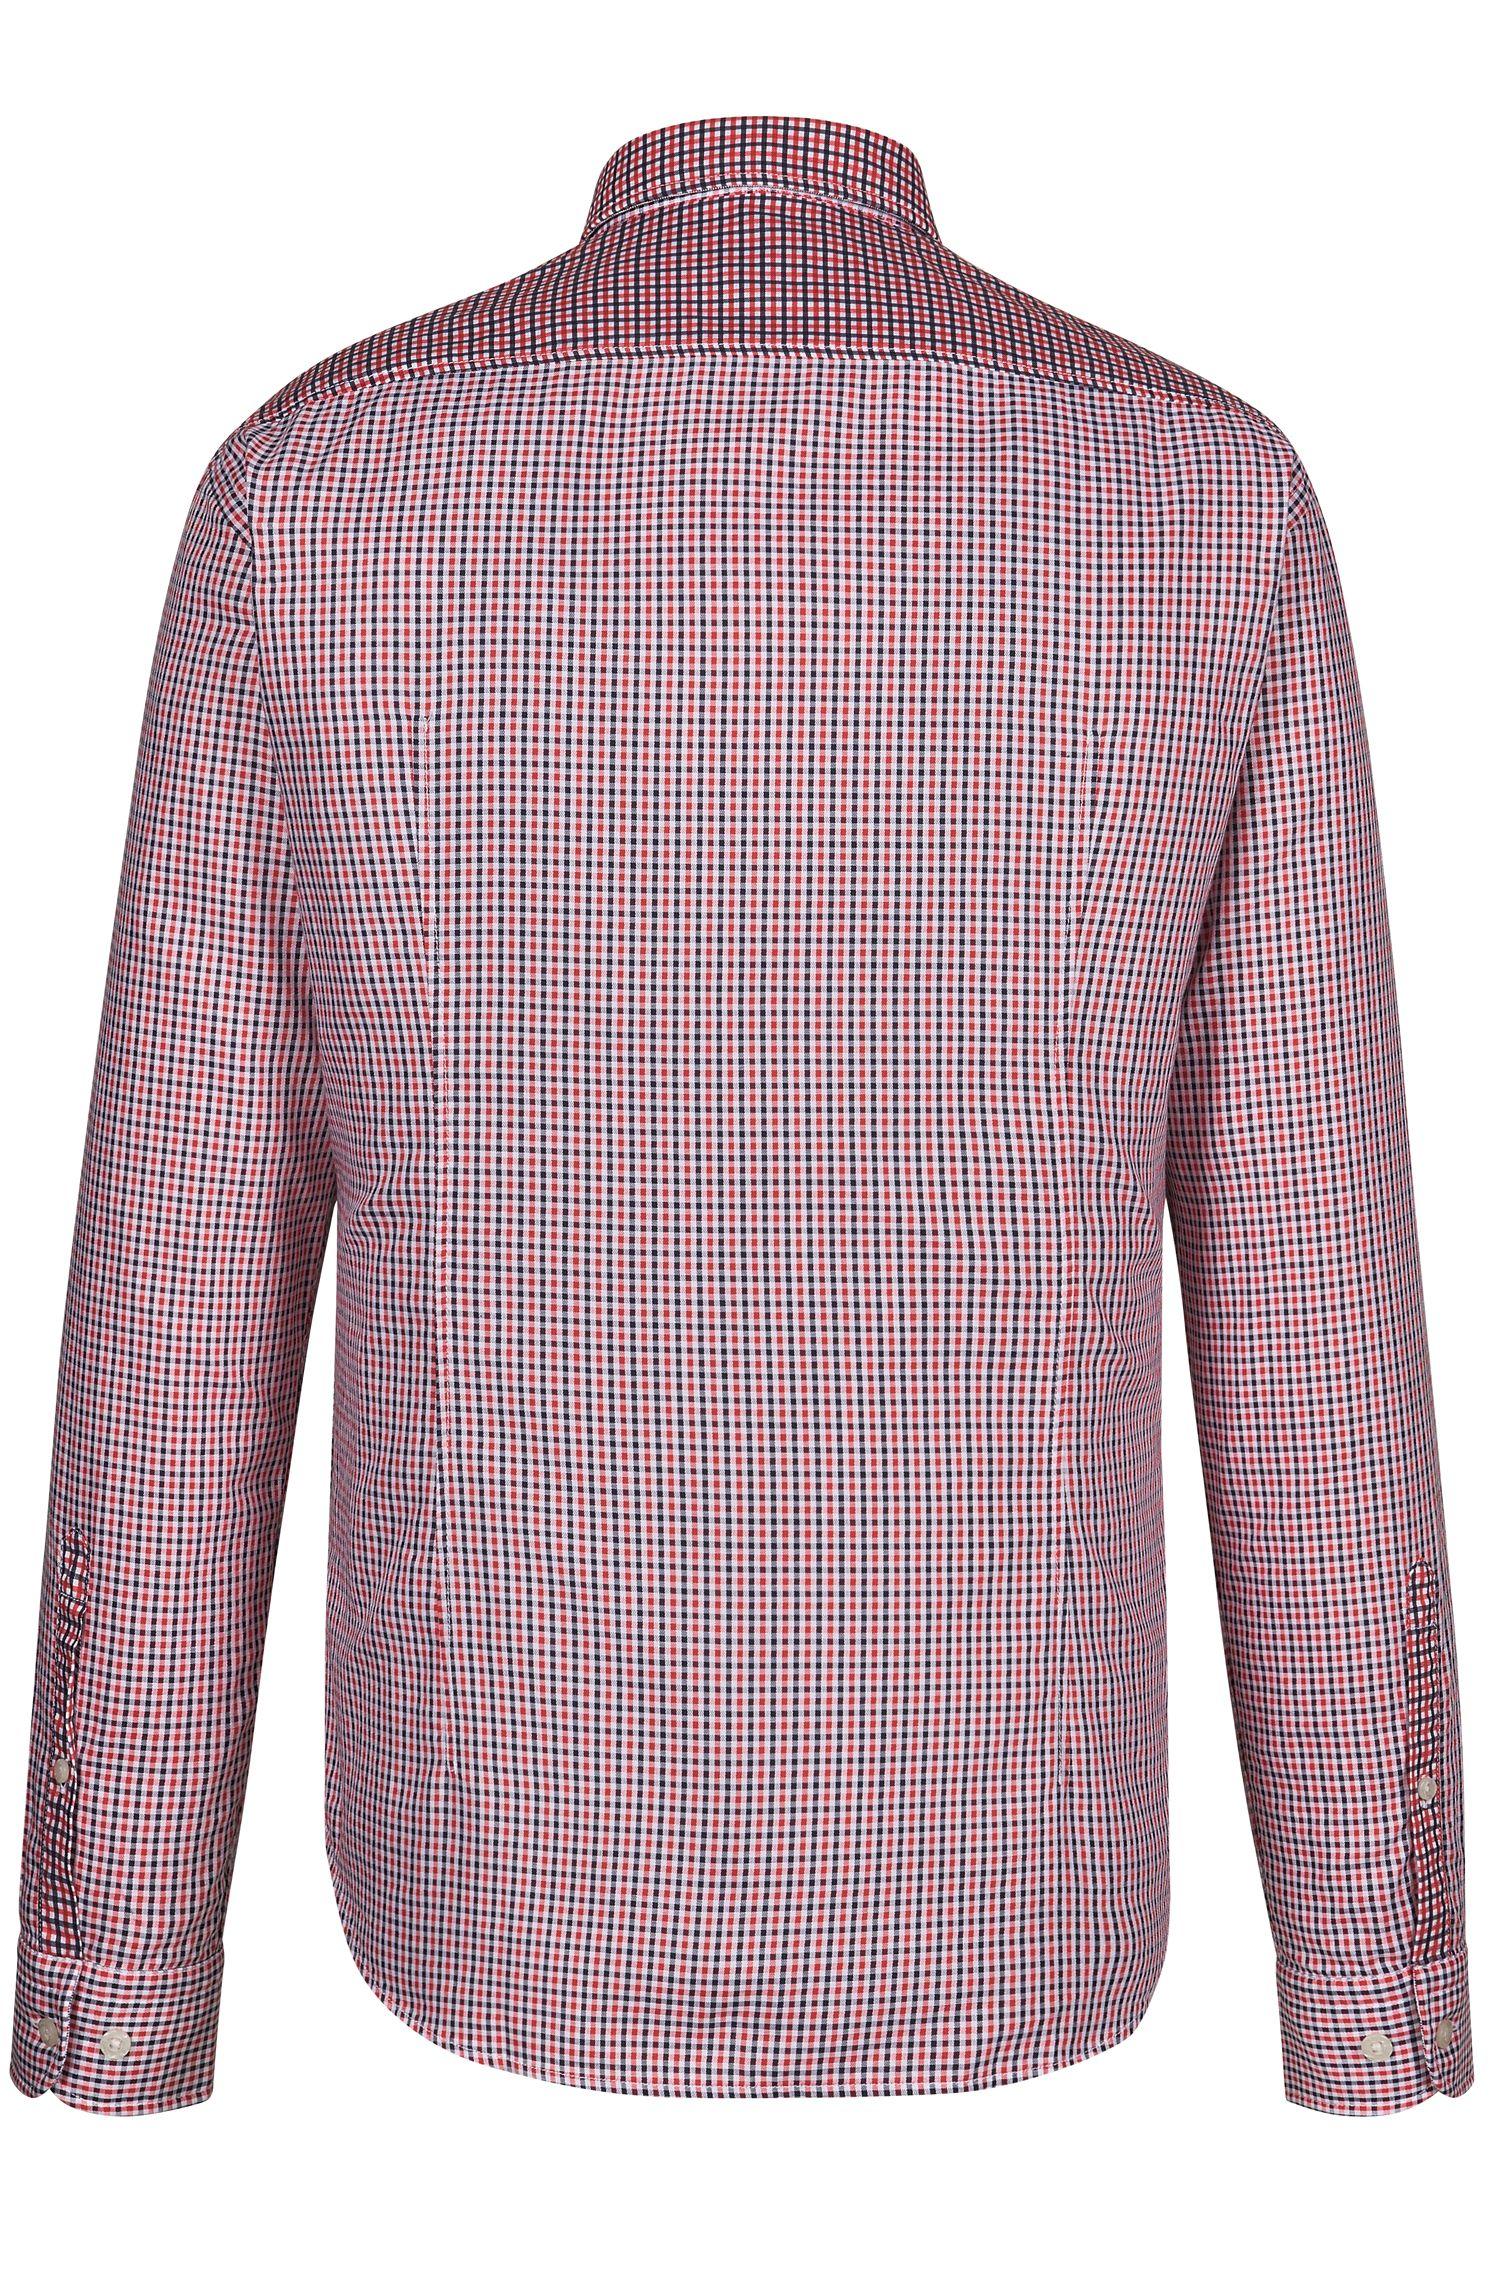 Checked Cotton Button Down Shirt, Regular Fit | C-Briar